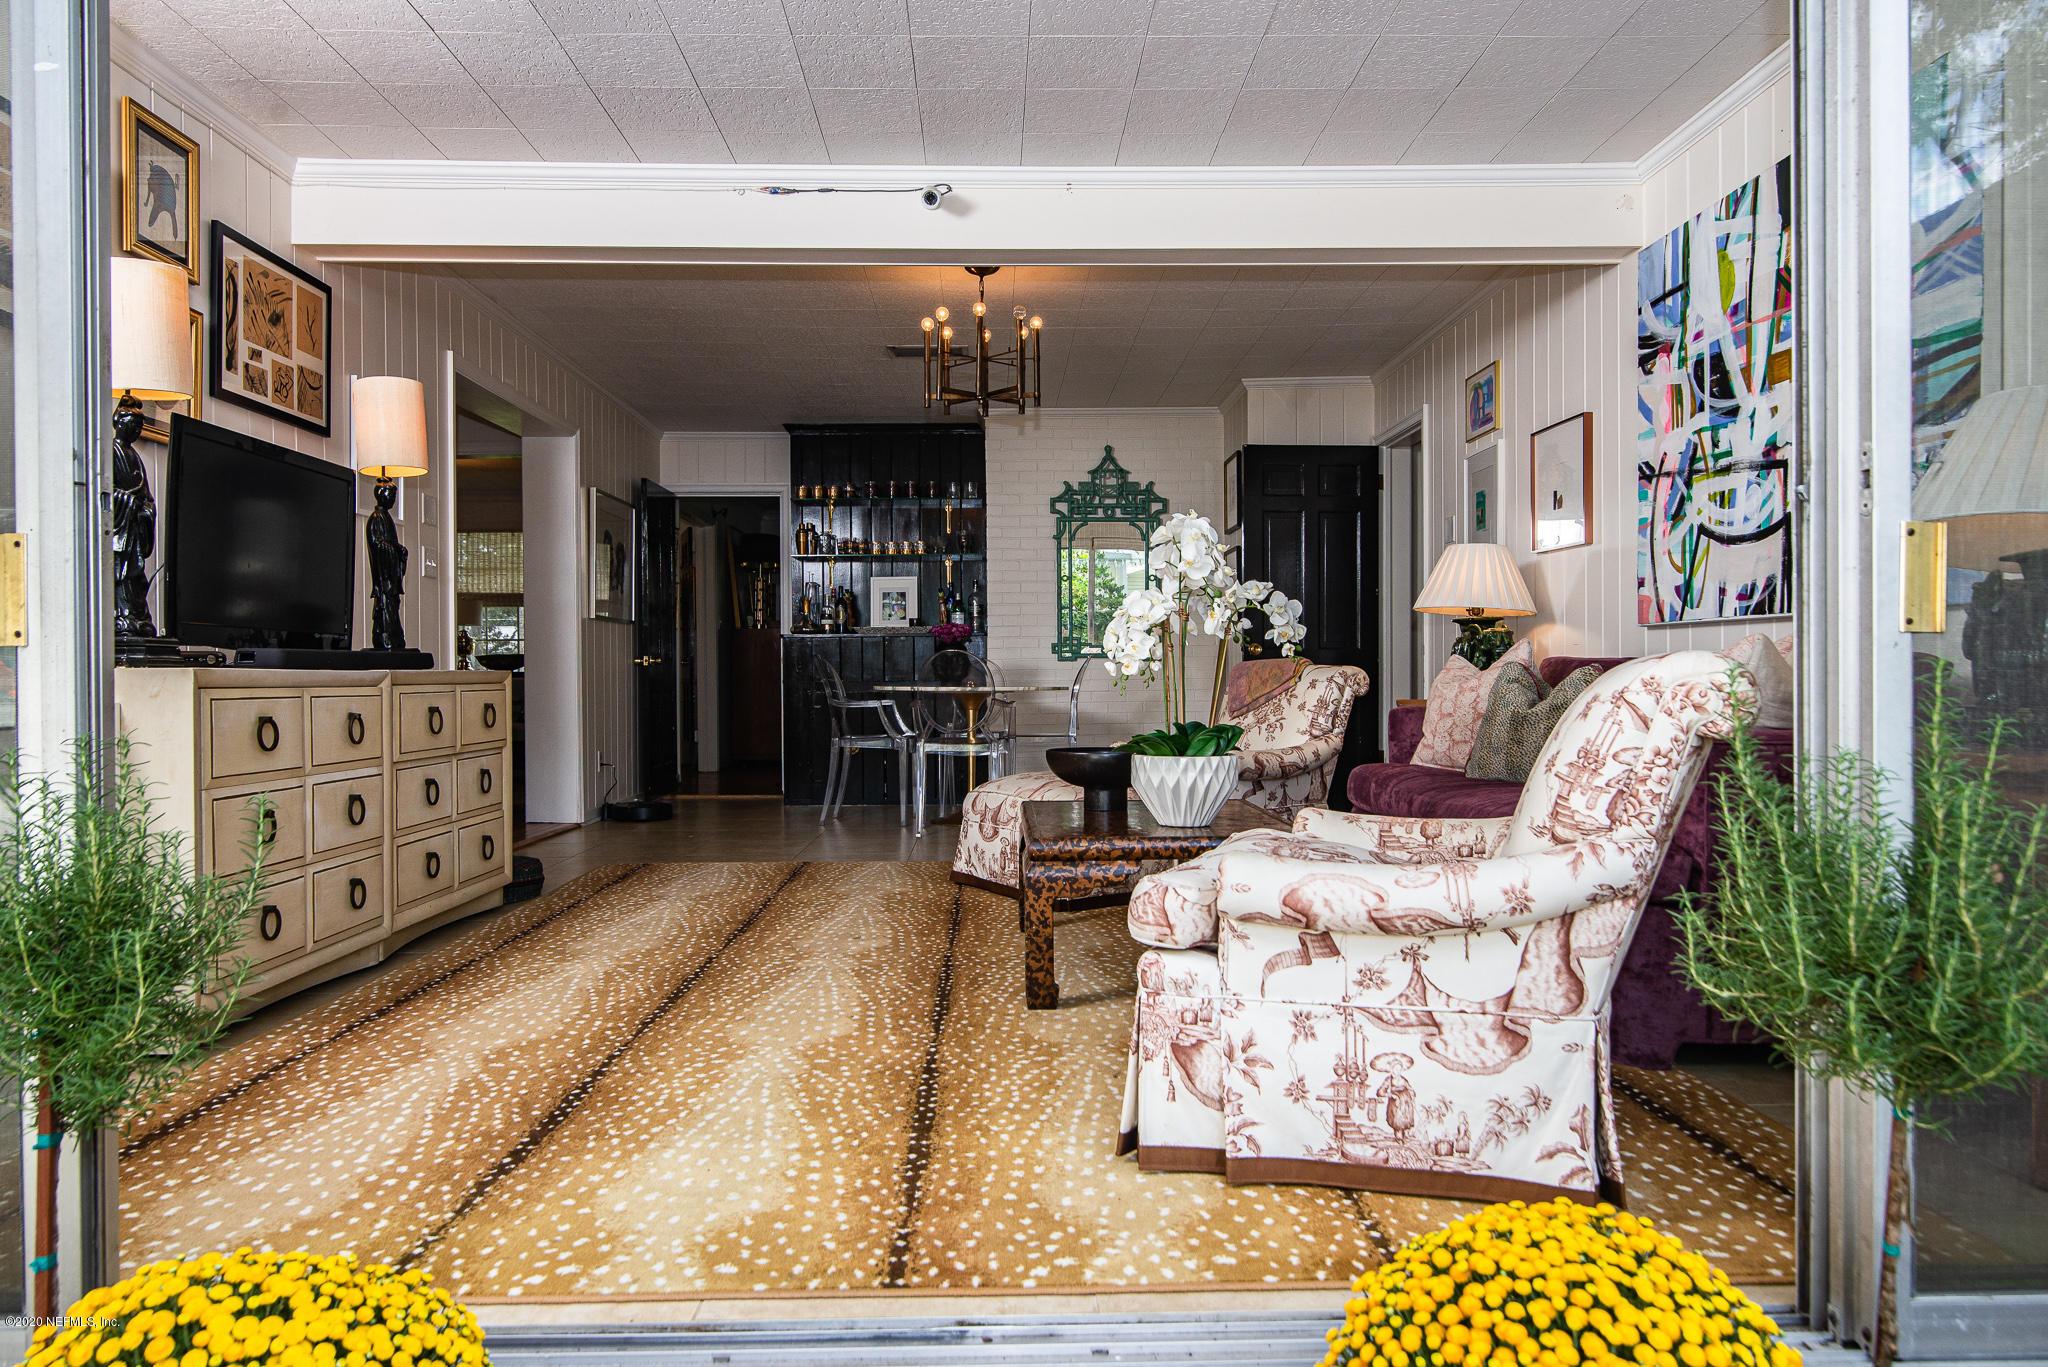 5044 ORTEGA, JACKSONVILLE, FLORIDA 32210, 3 Bedrooms Bedrooms, ,2 BathroomsBathrooms,Residential,For sale,ORTEGA,1079172